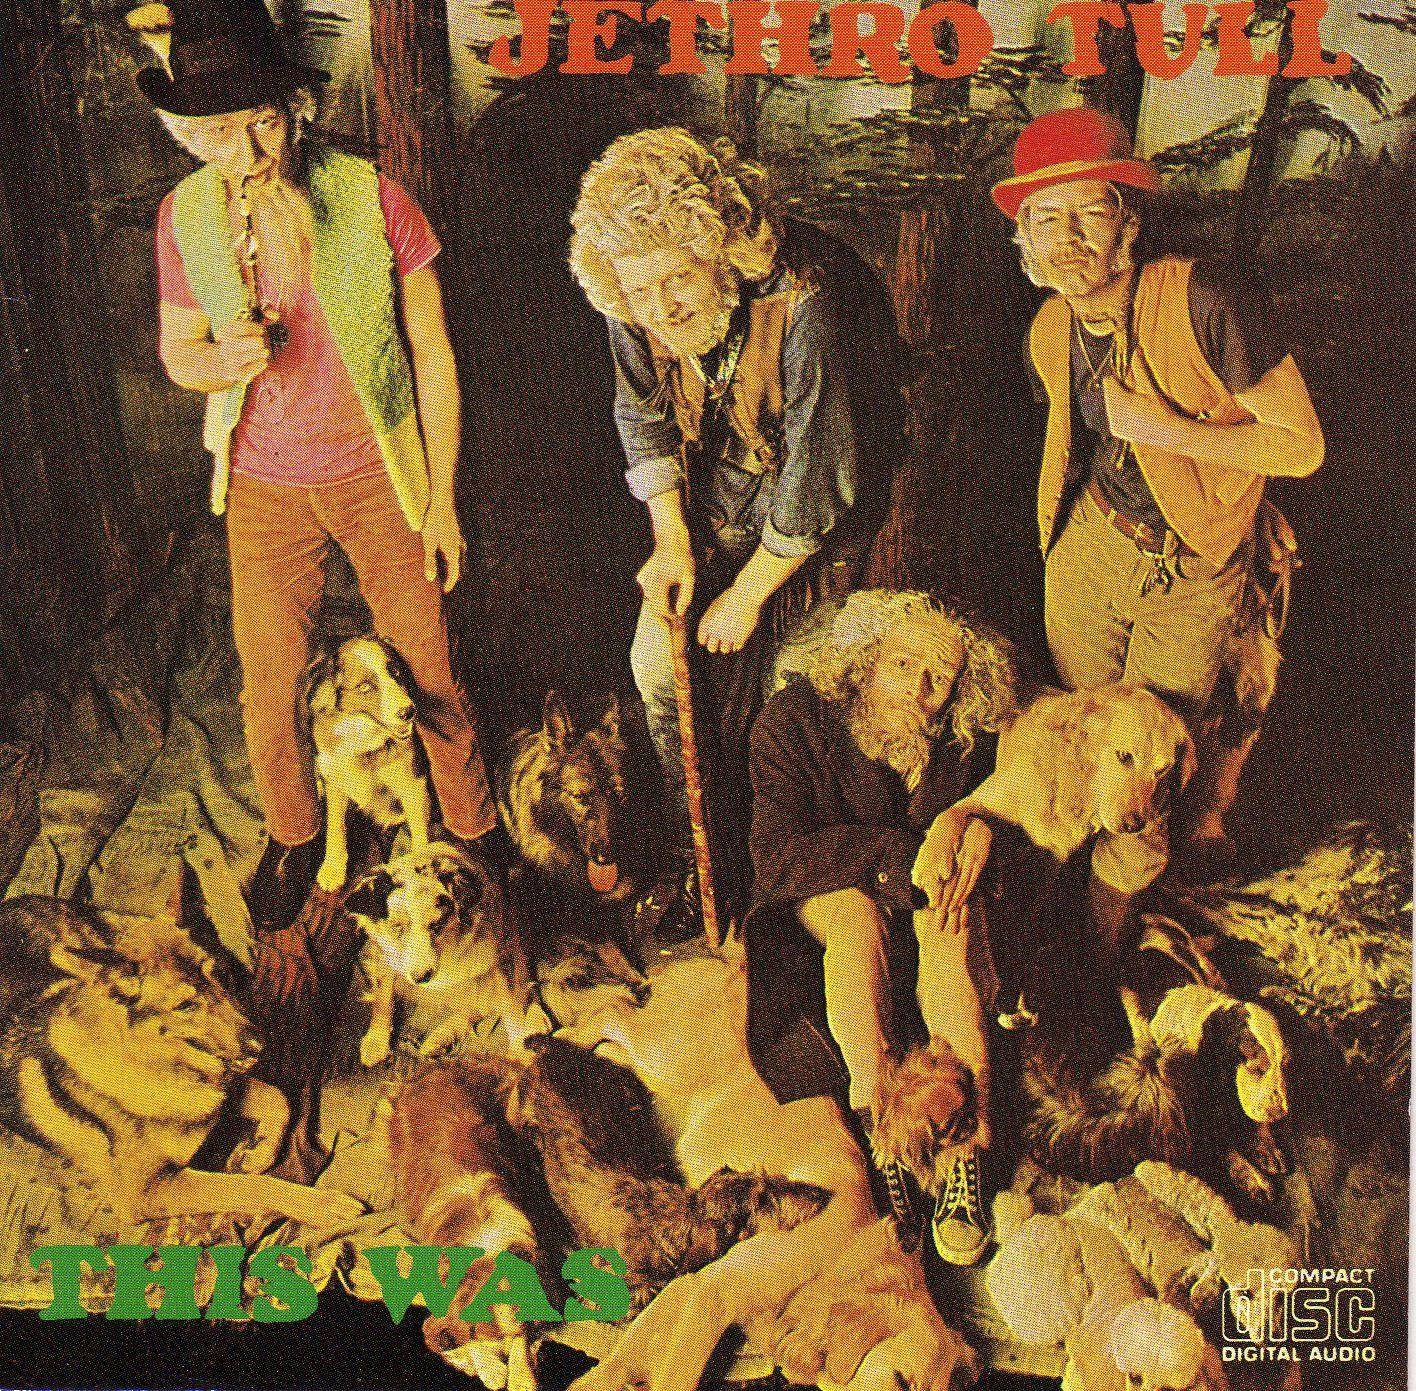 Jazz Rock Fusion Guitar: Jethro Tull - 1968 [1987] \